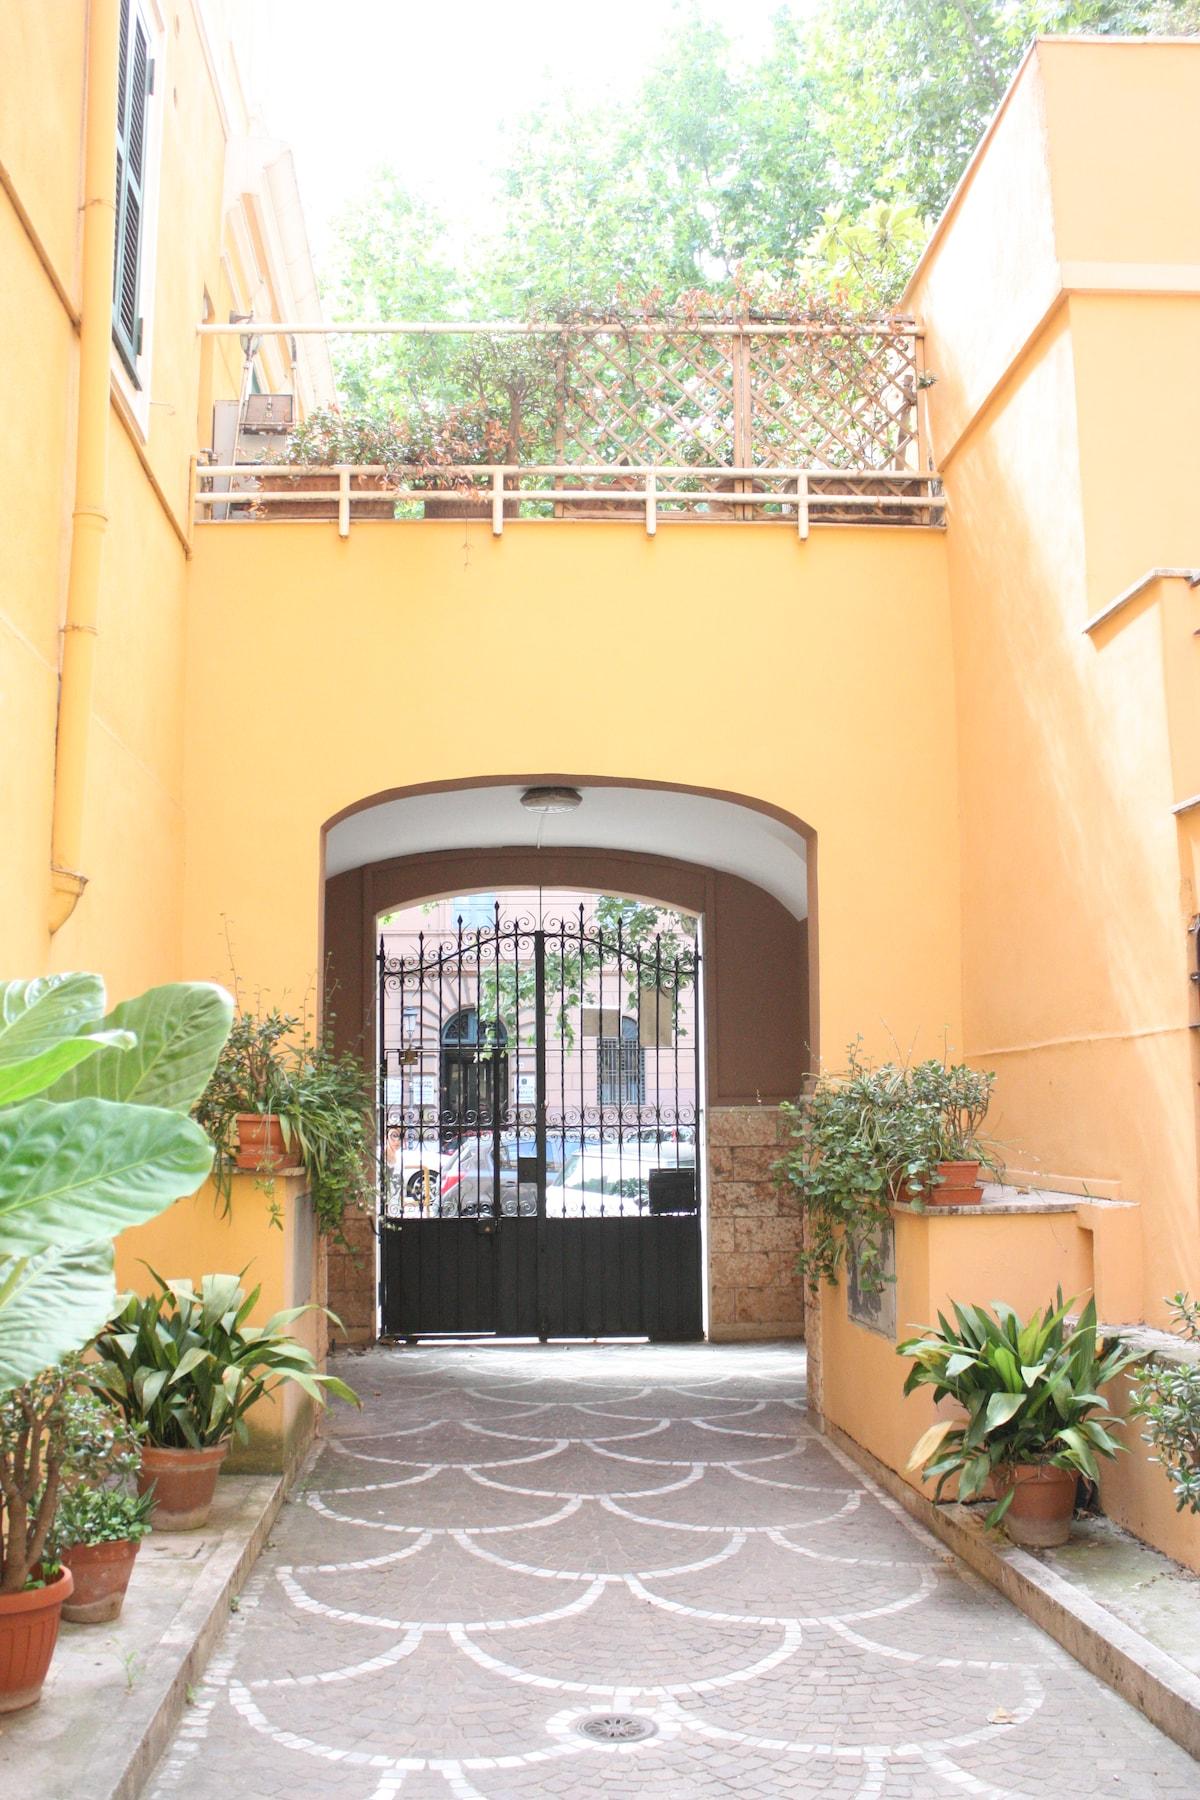 Dai ricci apartment close to city centre parks 4 2 apartments for rent in rome lazio italy